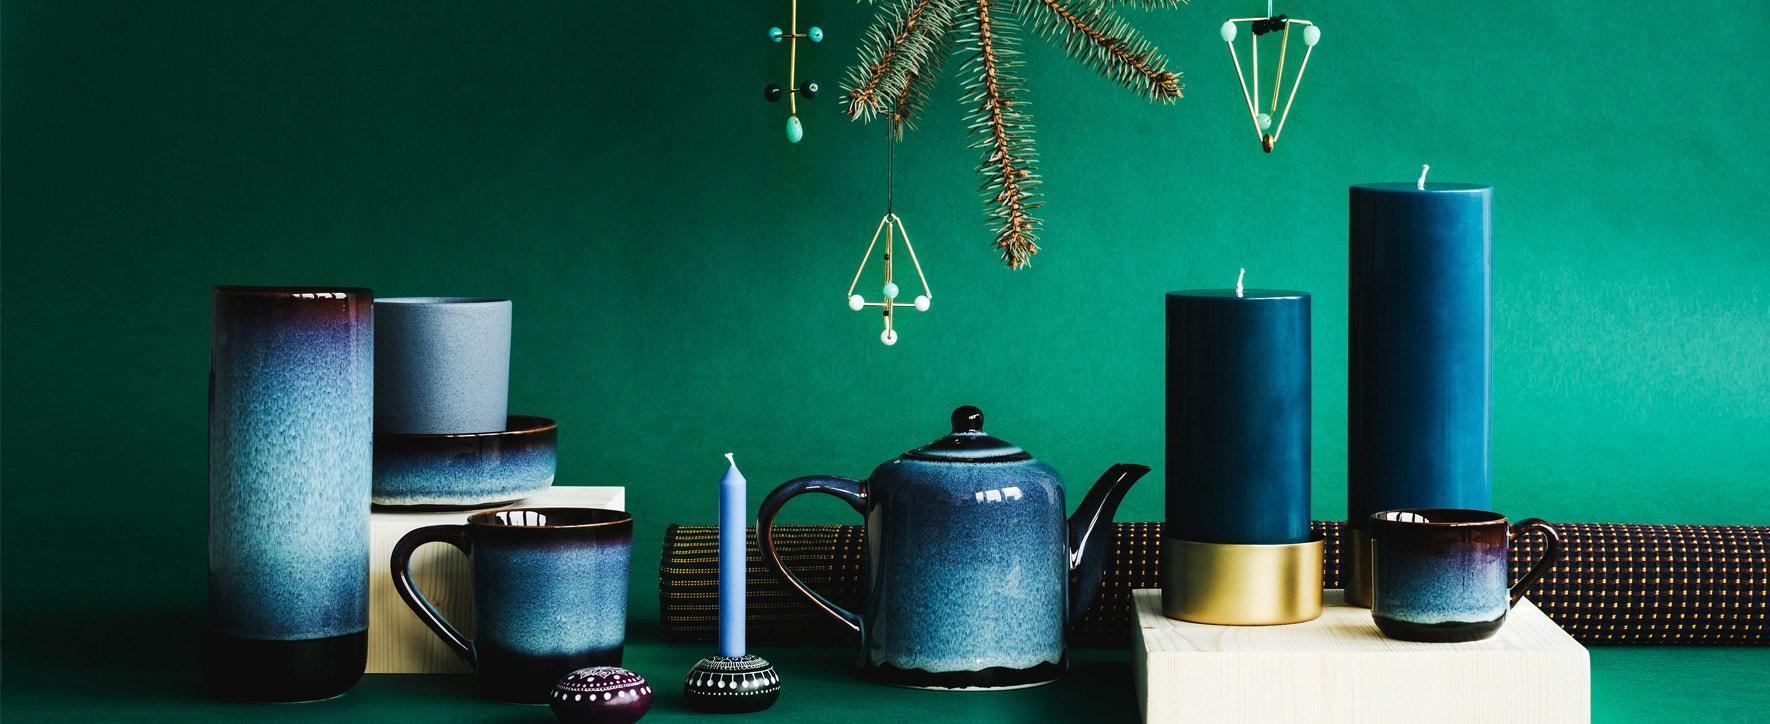 Kollektion Bell - Foto: GEPA The Fair Trade Company / Caroline Schreer